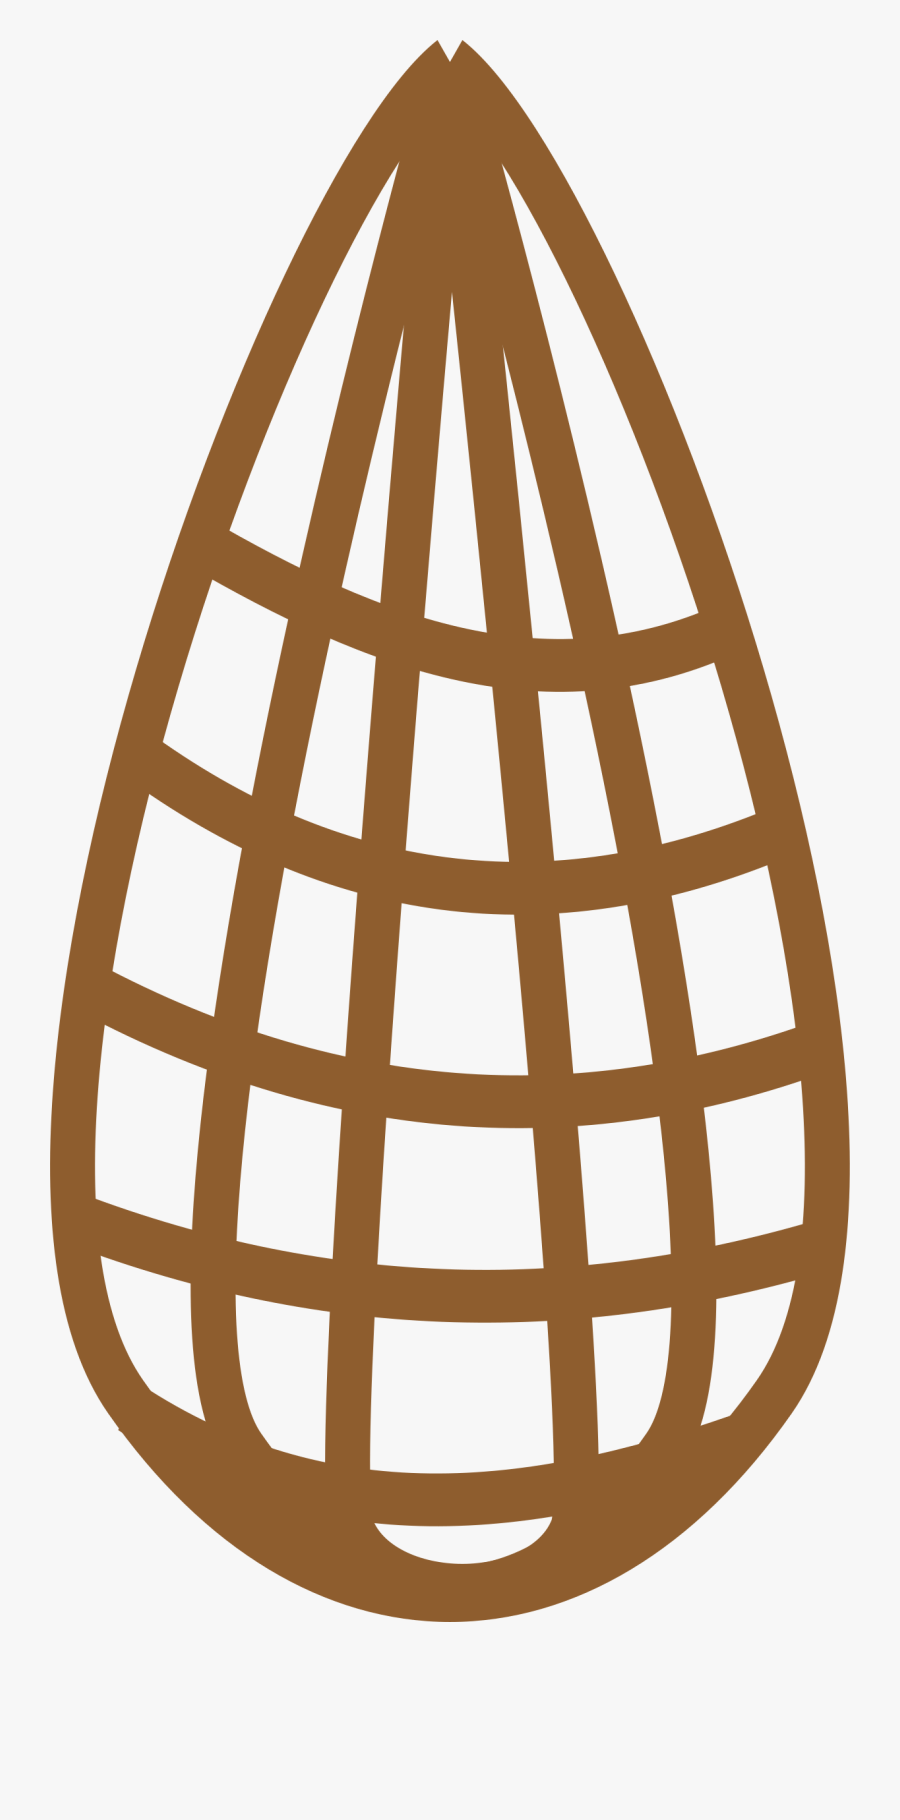 Fishing Net Clip Art Clipartfest Clipart - Fishing Nets Clip Art, Transparent Clipart